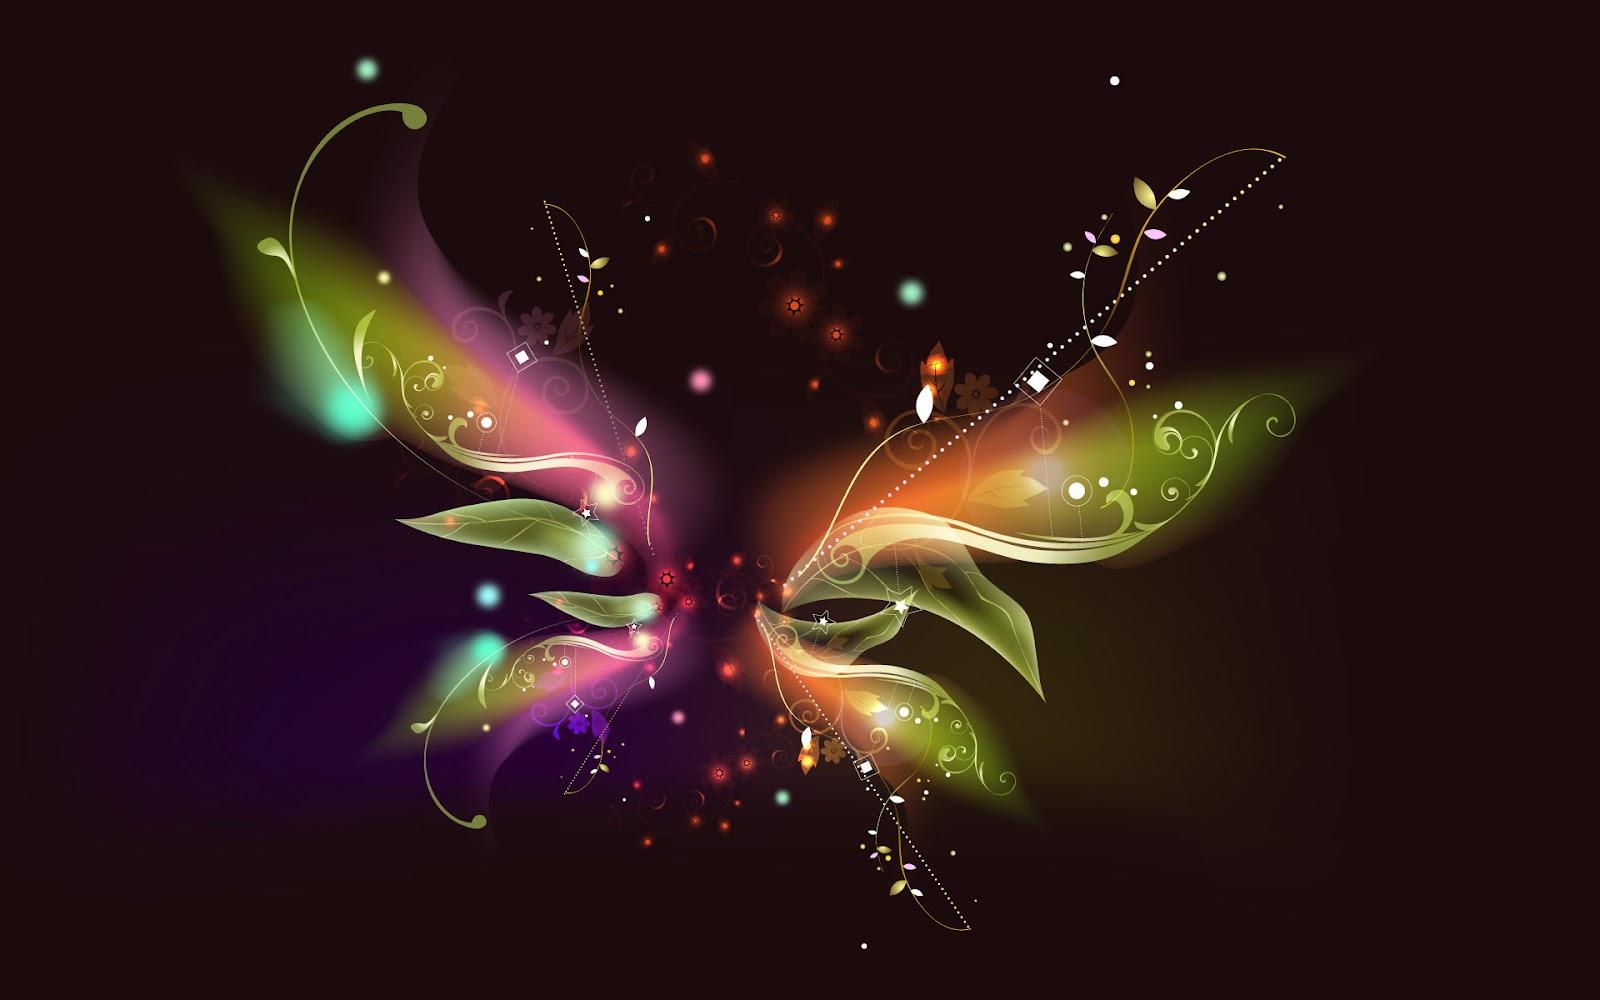 uneedallinside 50 amazing colorful wallpapers desktop